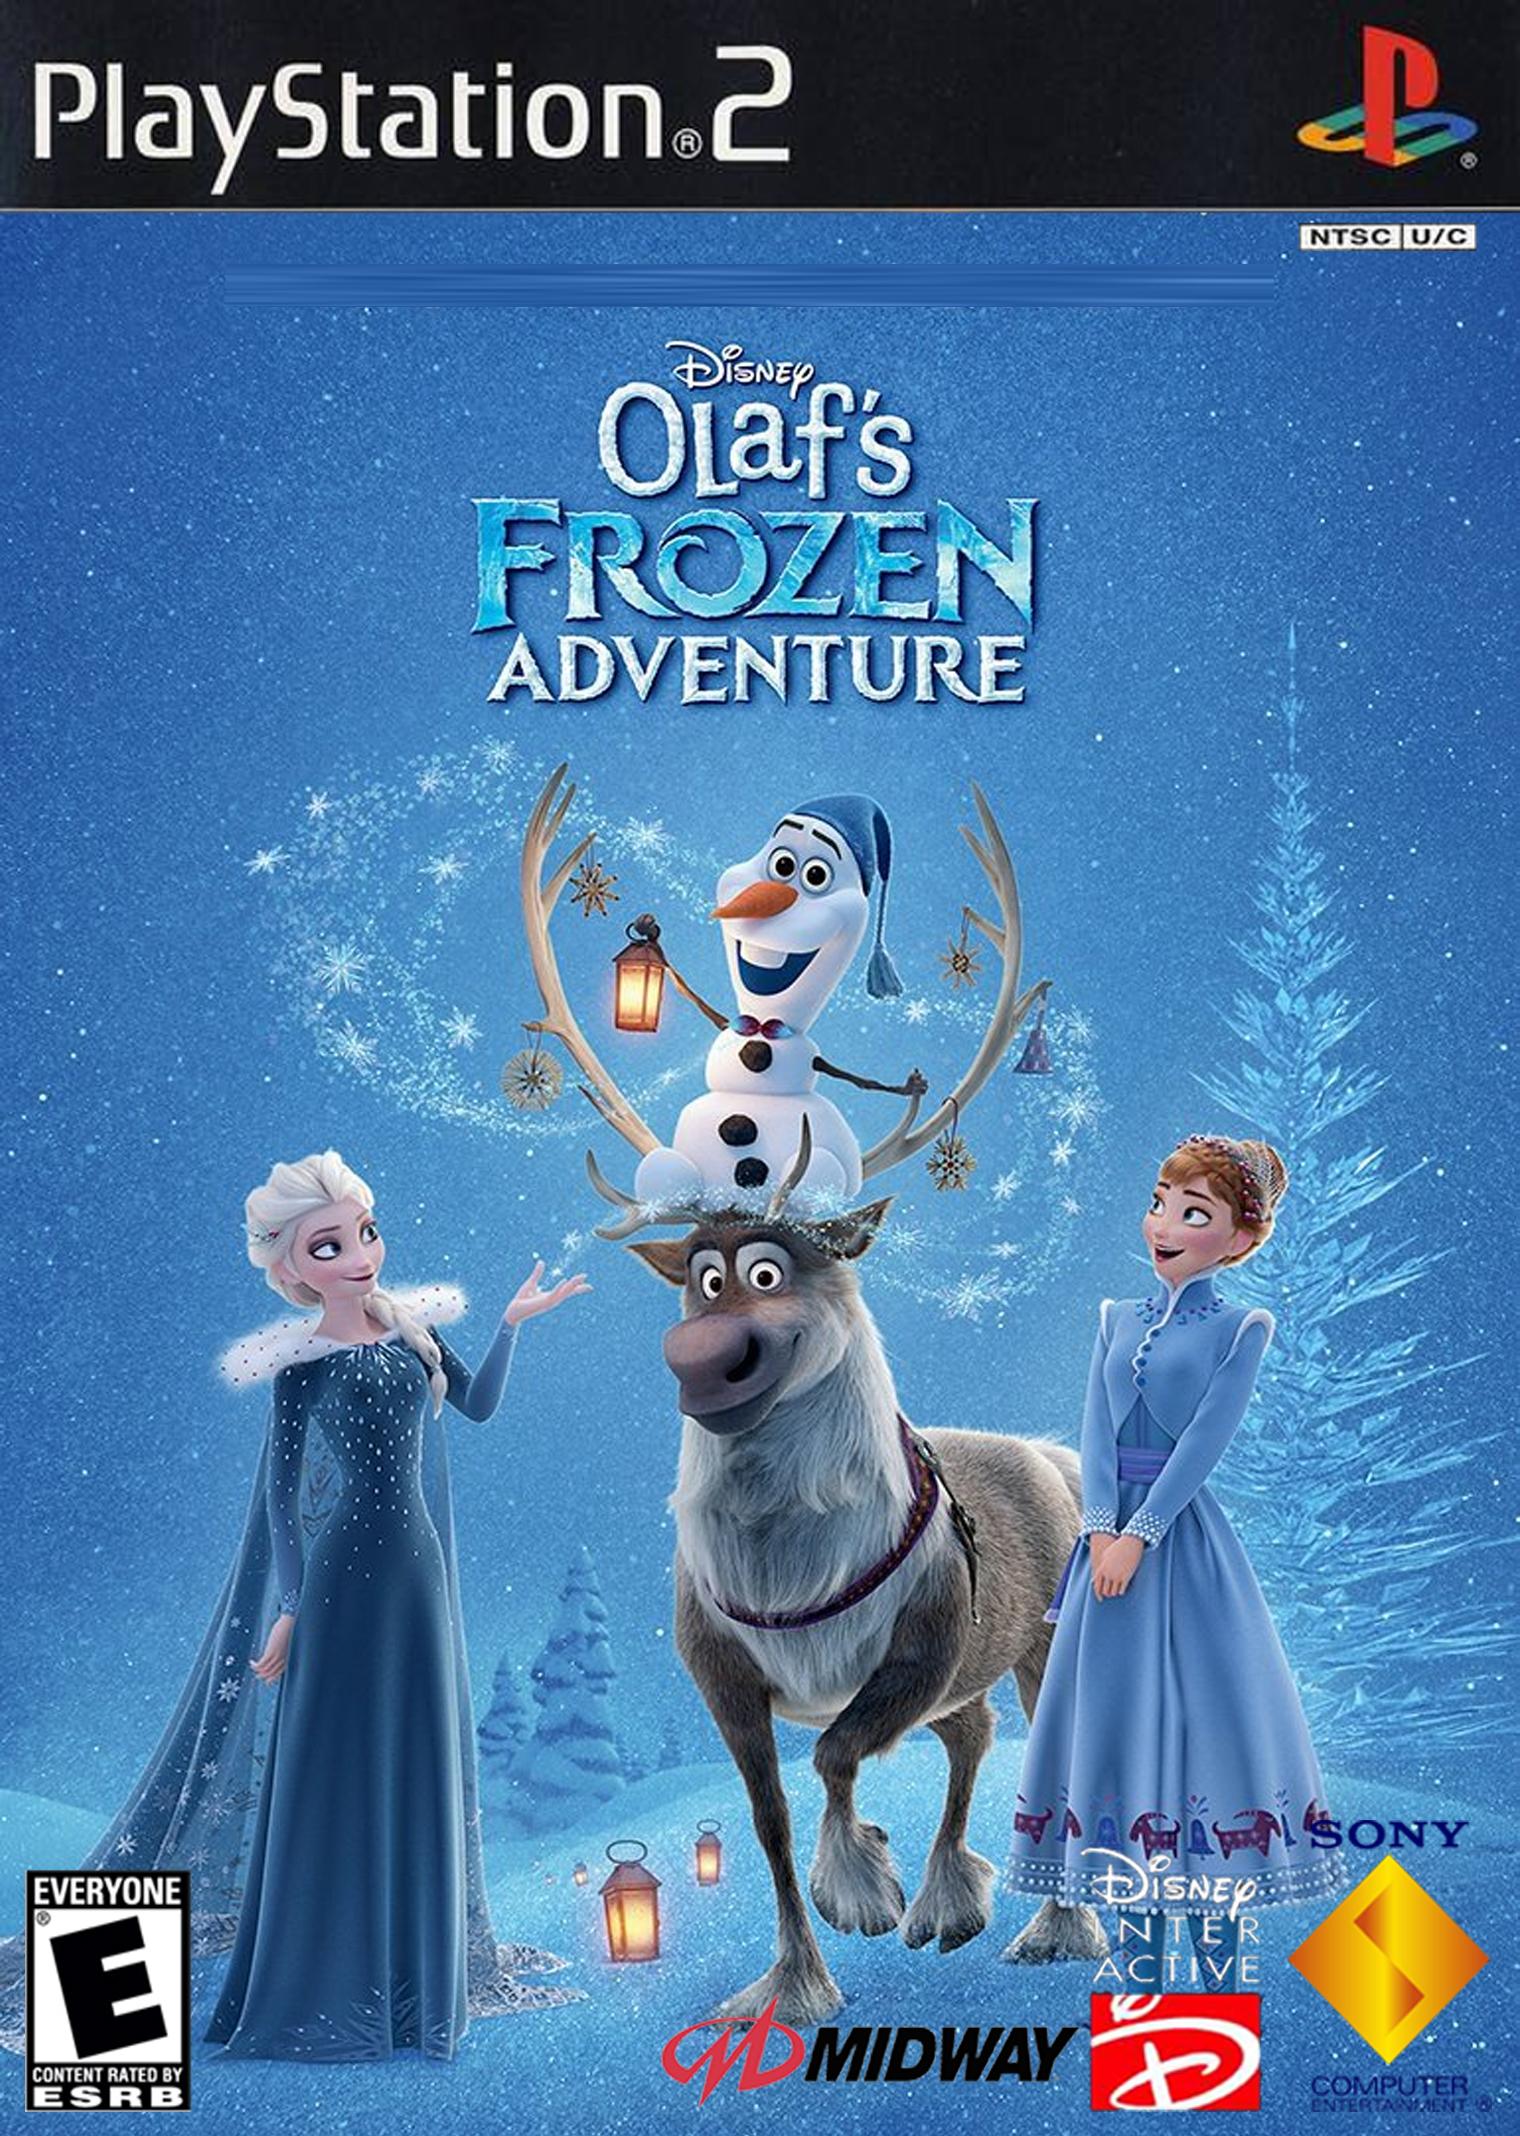 Walt Disney's Olaf's Frozen Adventure (2004) PlayStation 2 cover art